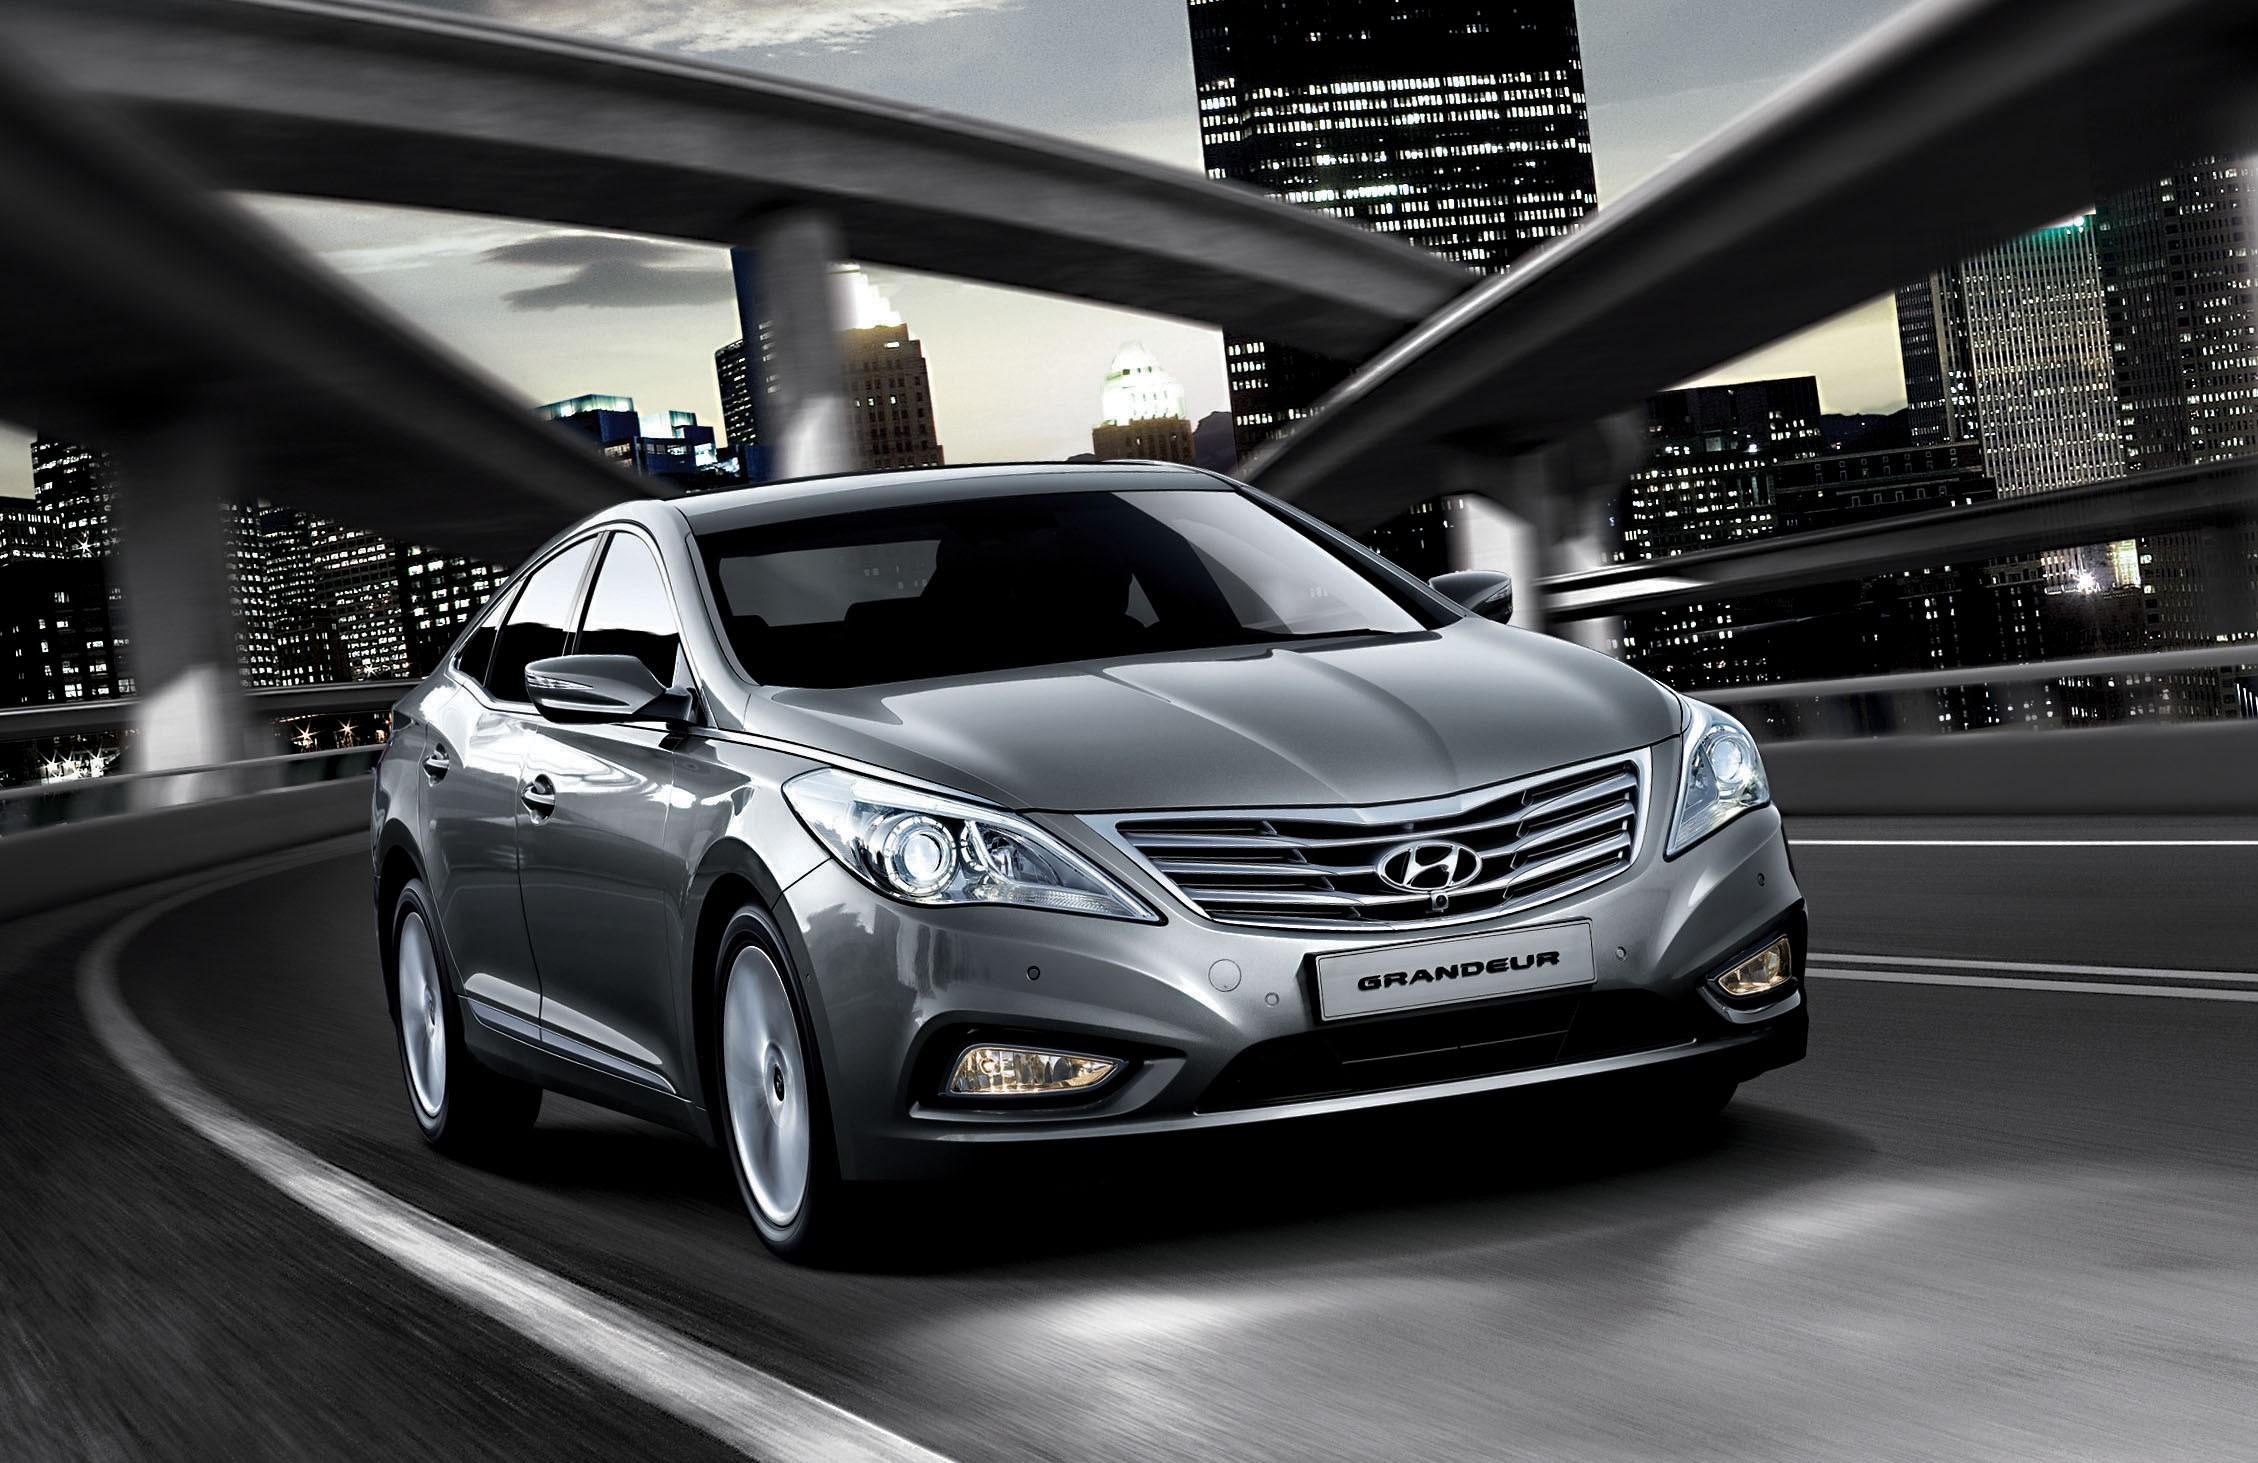 Toyota Large Suv >> 2012 Hyundai Grandeur unveiled in Korea - Photos